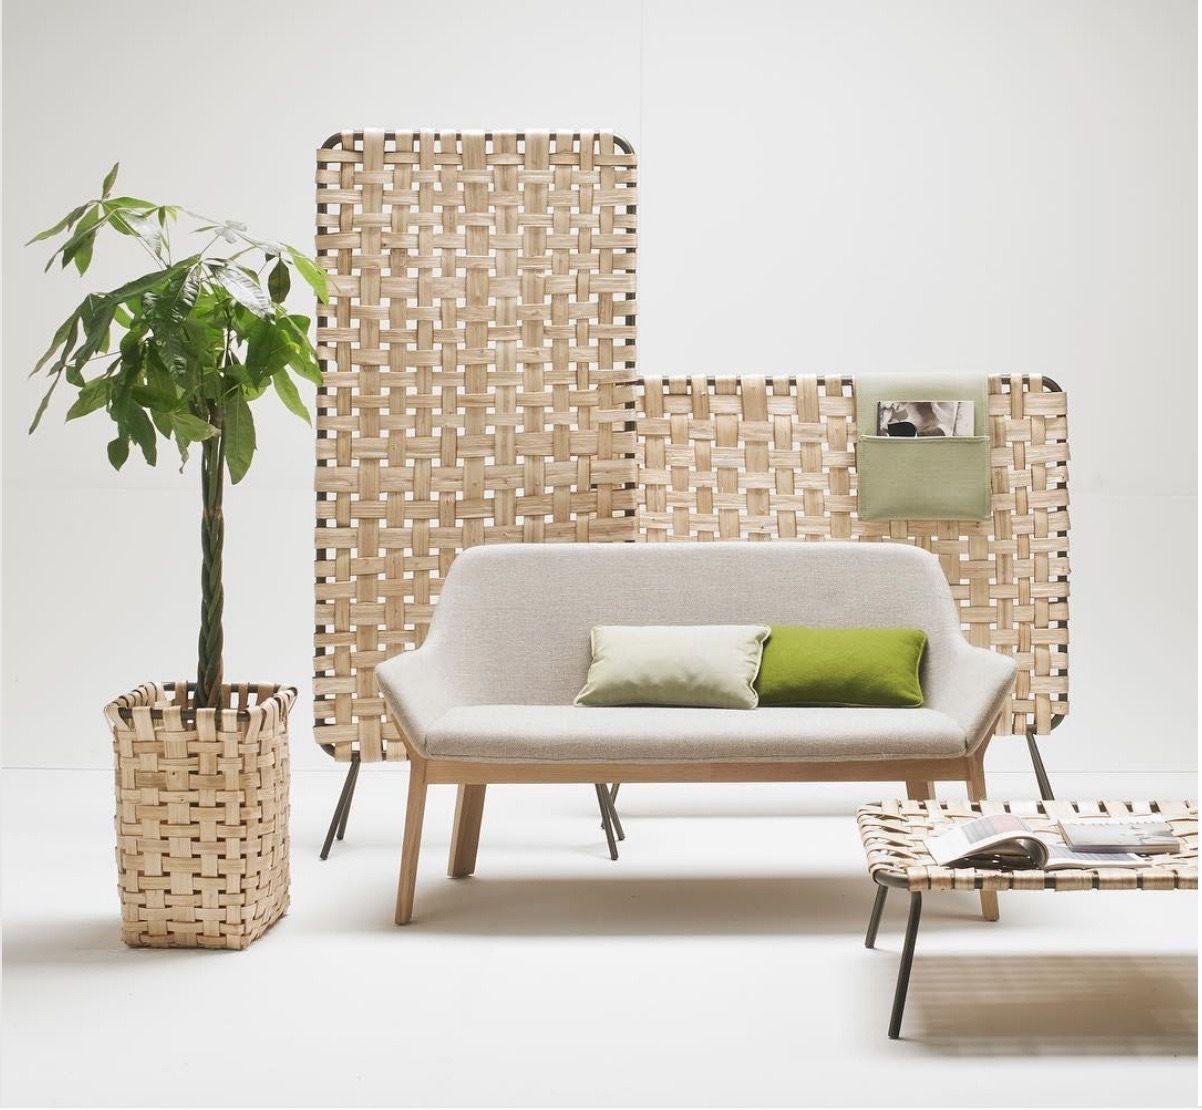 Alki Furniture On Instagram: U201cZumitz Collection Designed By  @iratzokilizaso. Photography: @